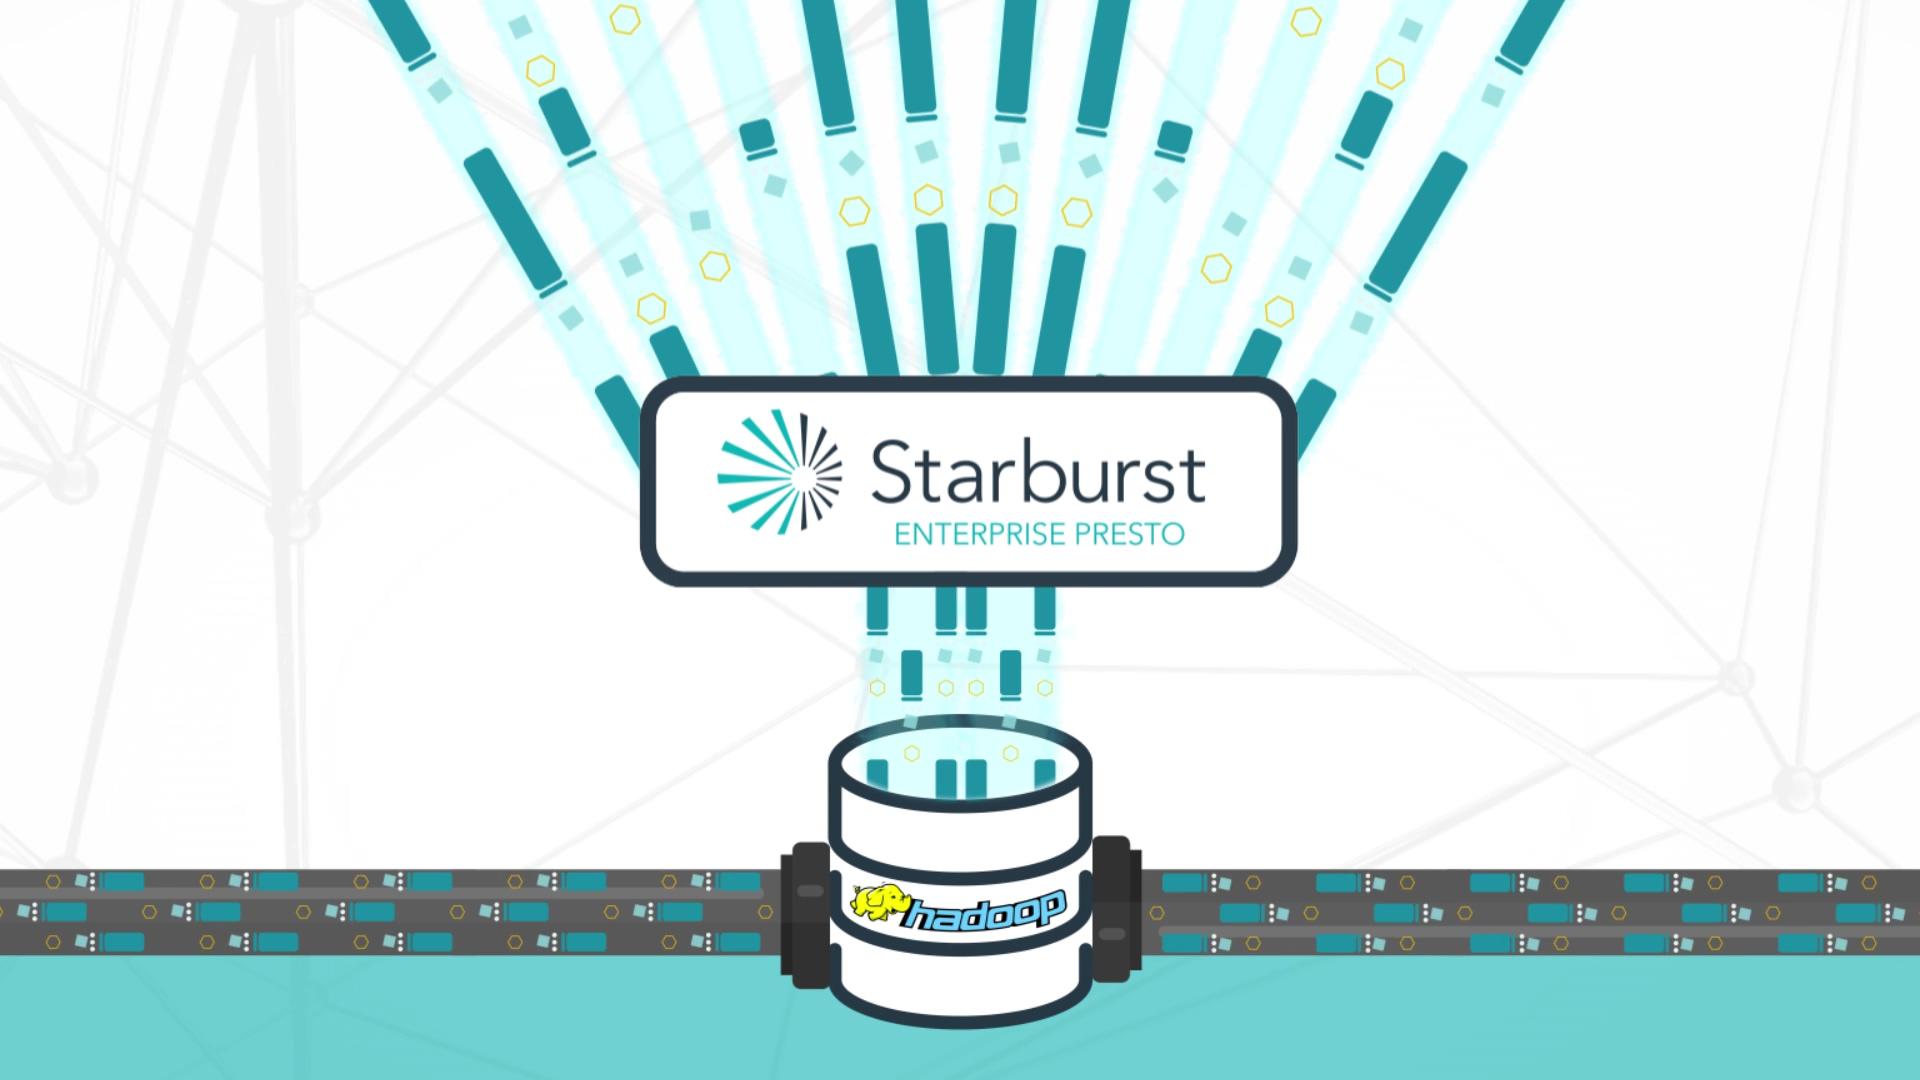 Future-Proof Hadoop with Starburst Enterprise Presto